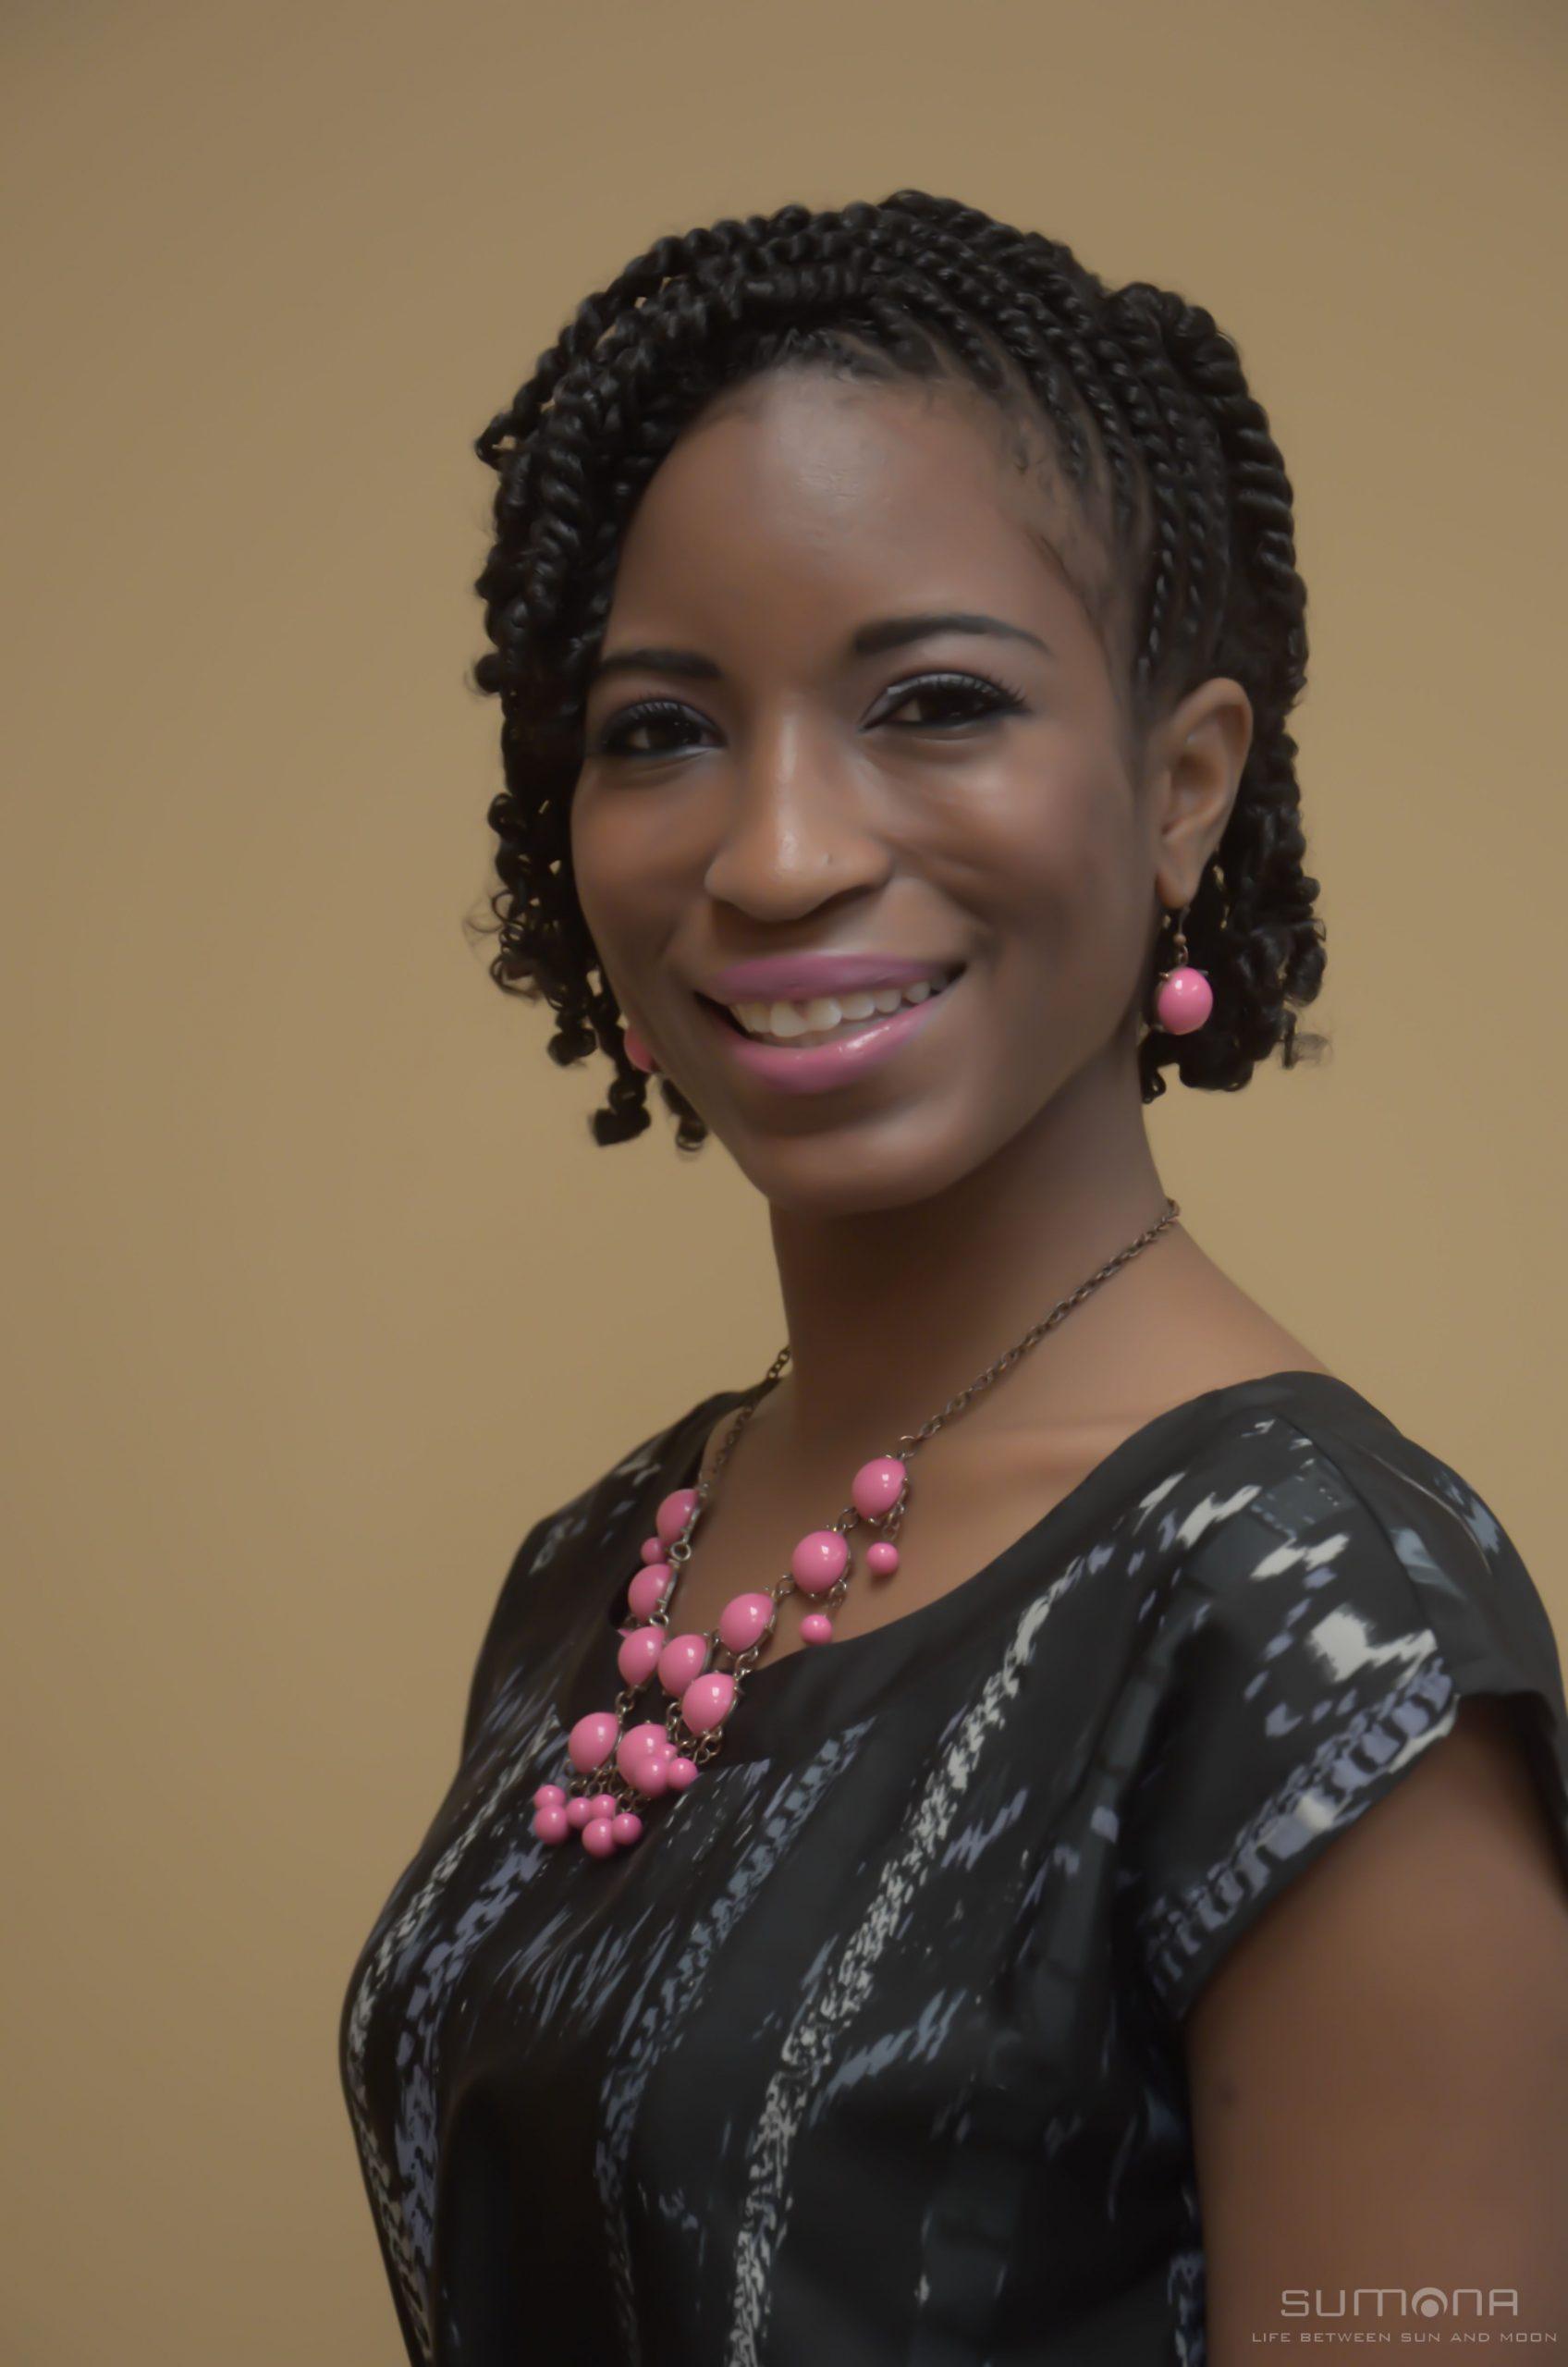 Natural black hairstyles for women hairstyleforblackwomen.net 41 scaled